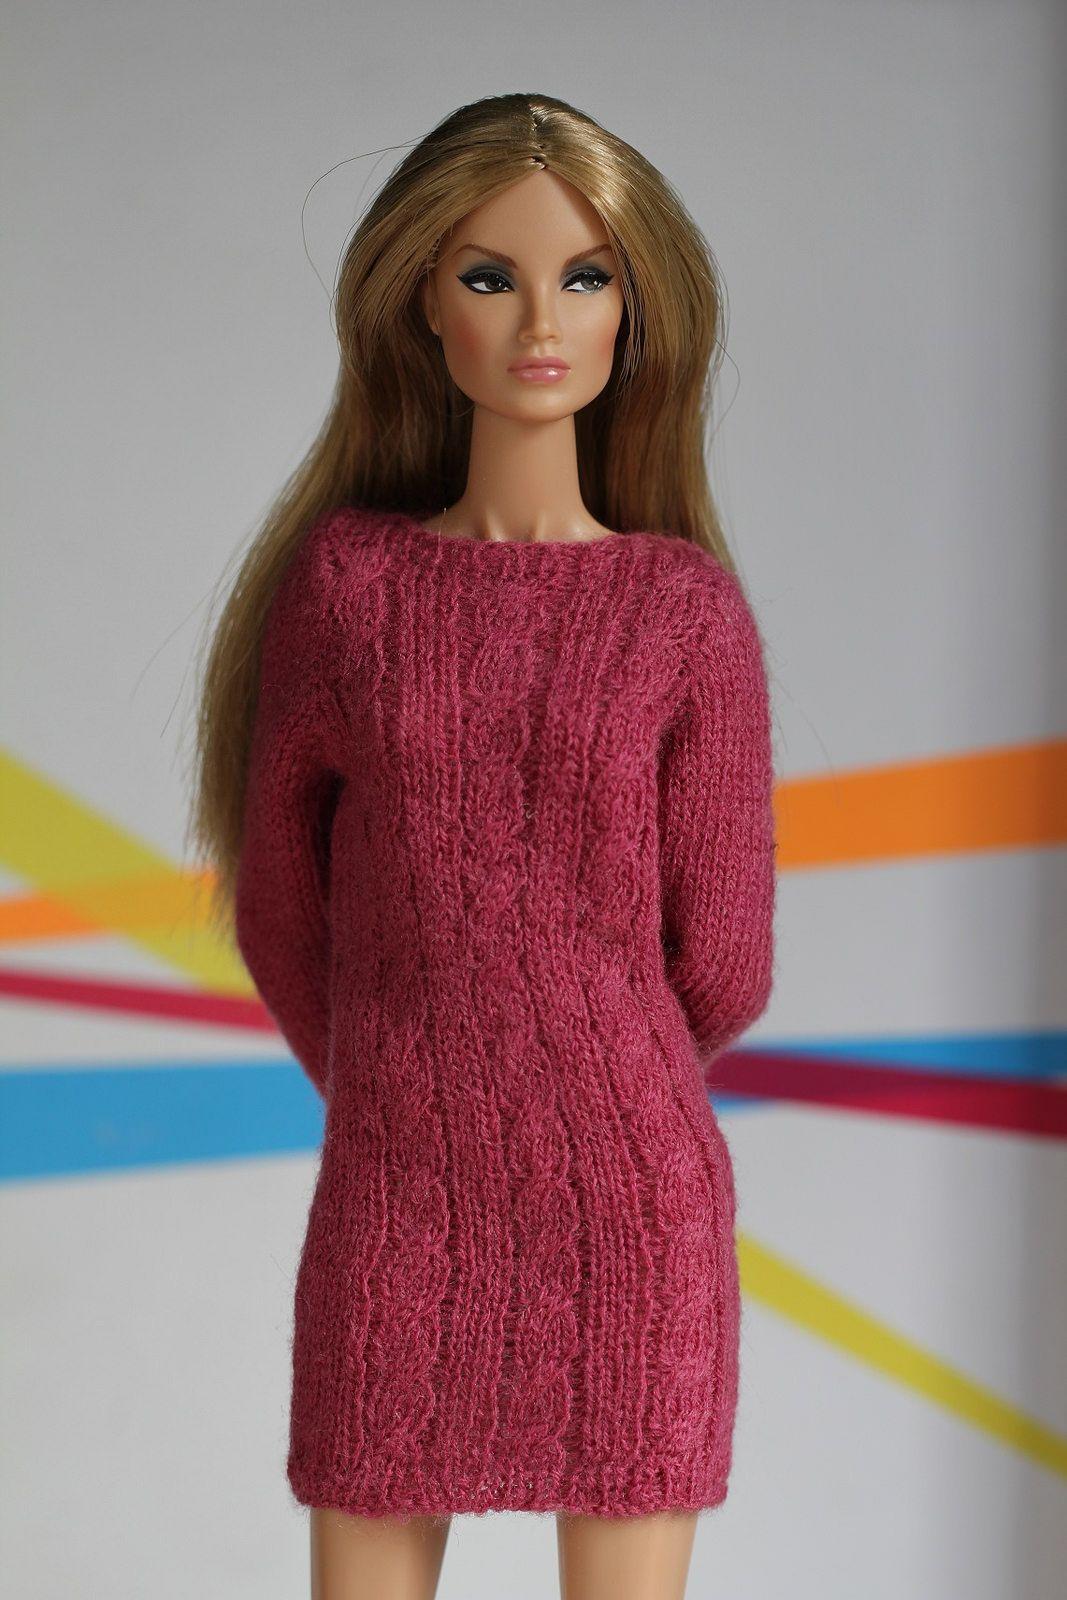 46.35.45.3 https://flic.kr/p/M9LLug   Be Daring Imogen   Barbie/Doll ...